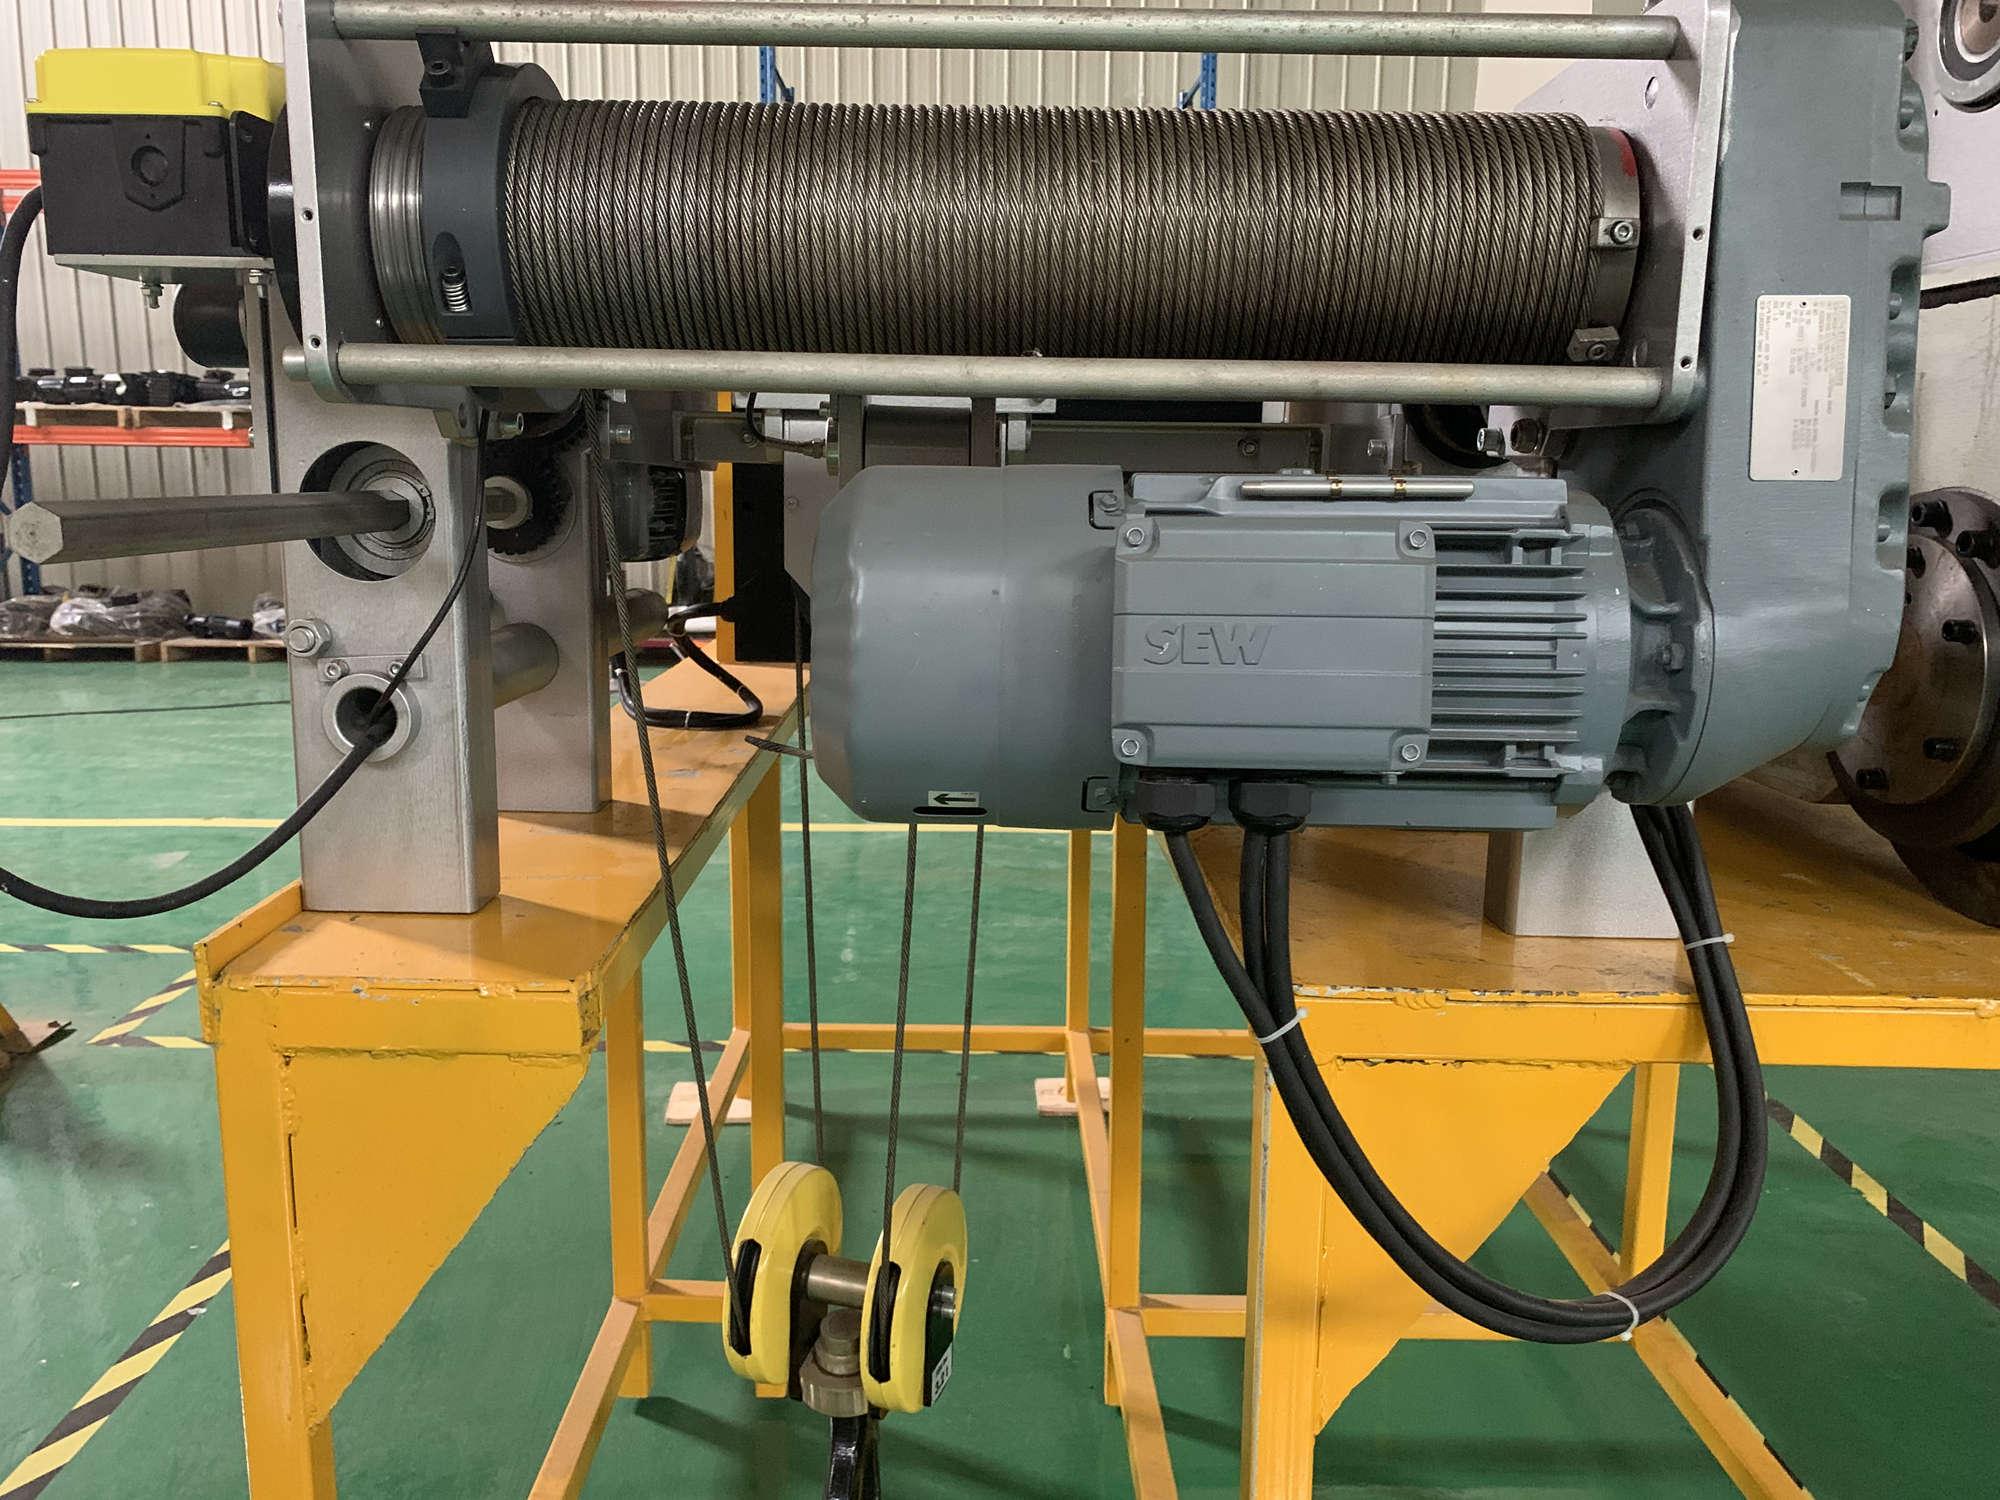 3 Ton European Type Single Girder Electric Wire Rope Hoist